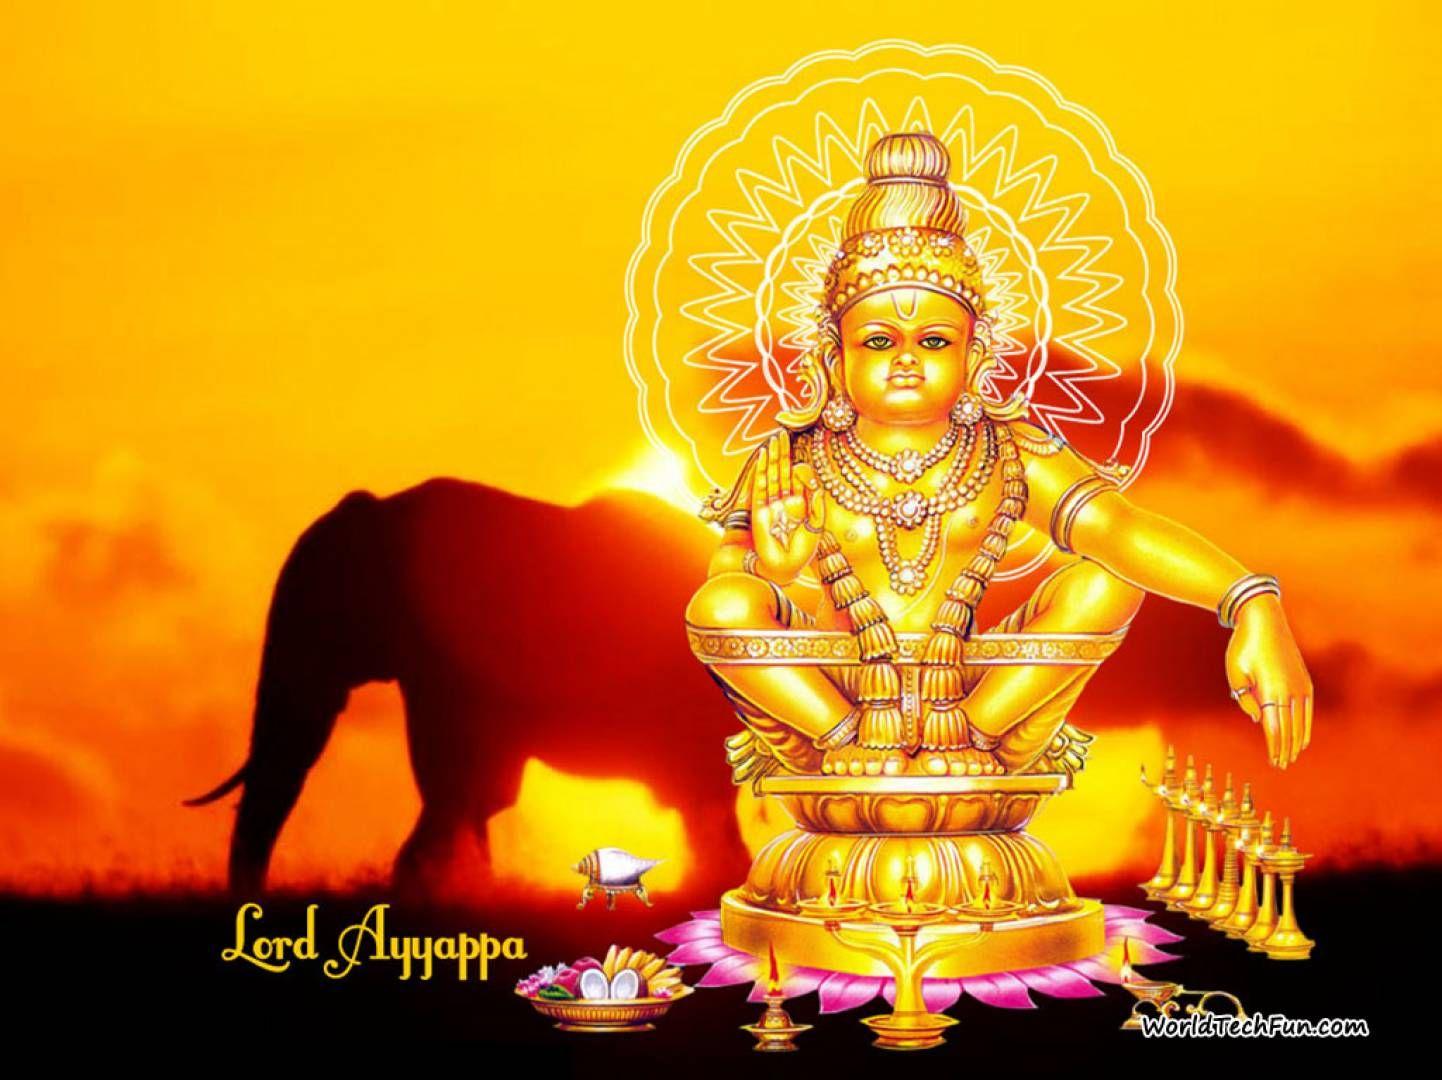 top download 1920x1080 swami ayyappa wallpapers wallpaper free download wallpaper images hd wallpaper wallpaper images hd wallpaper